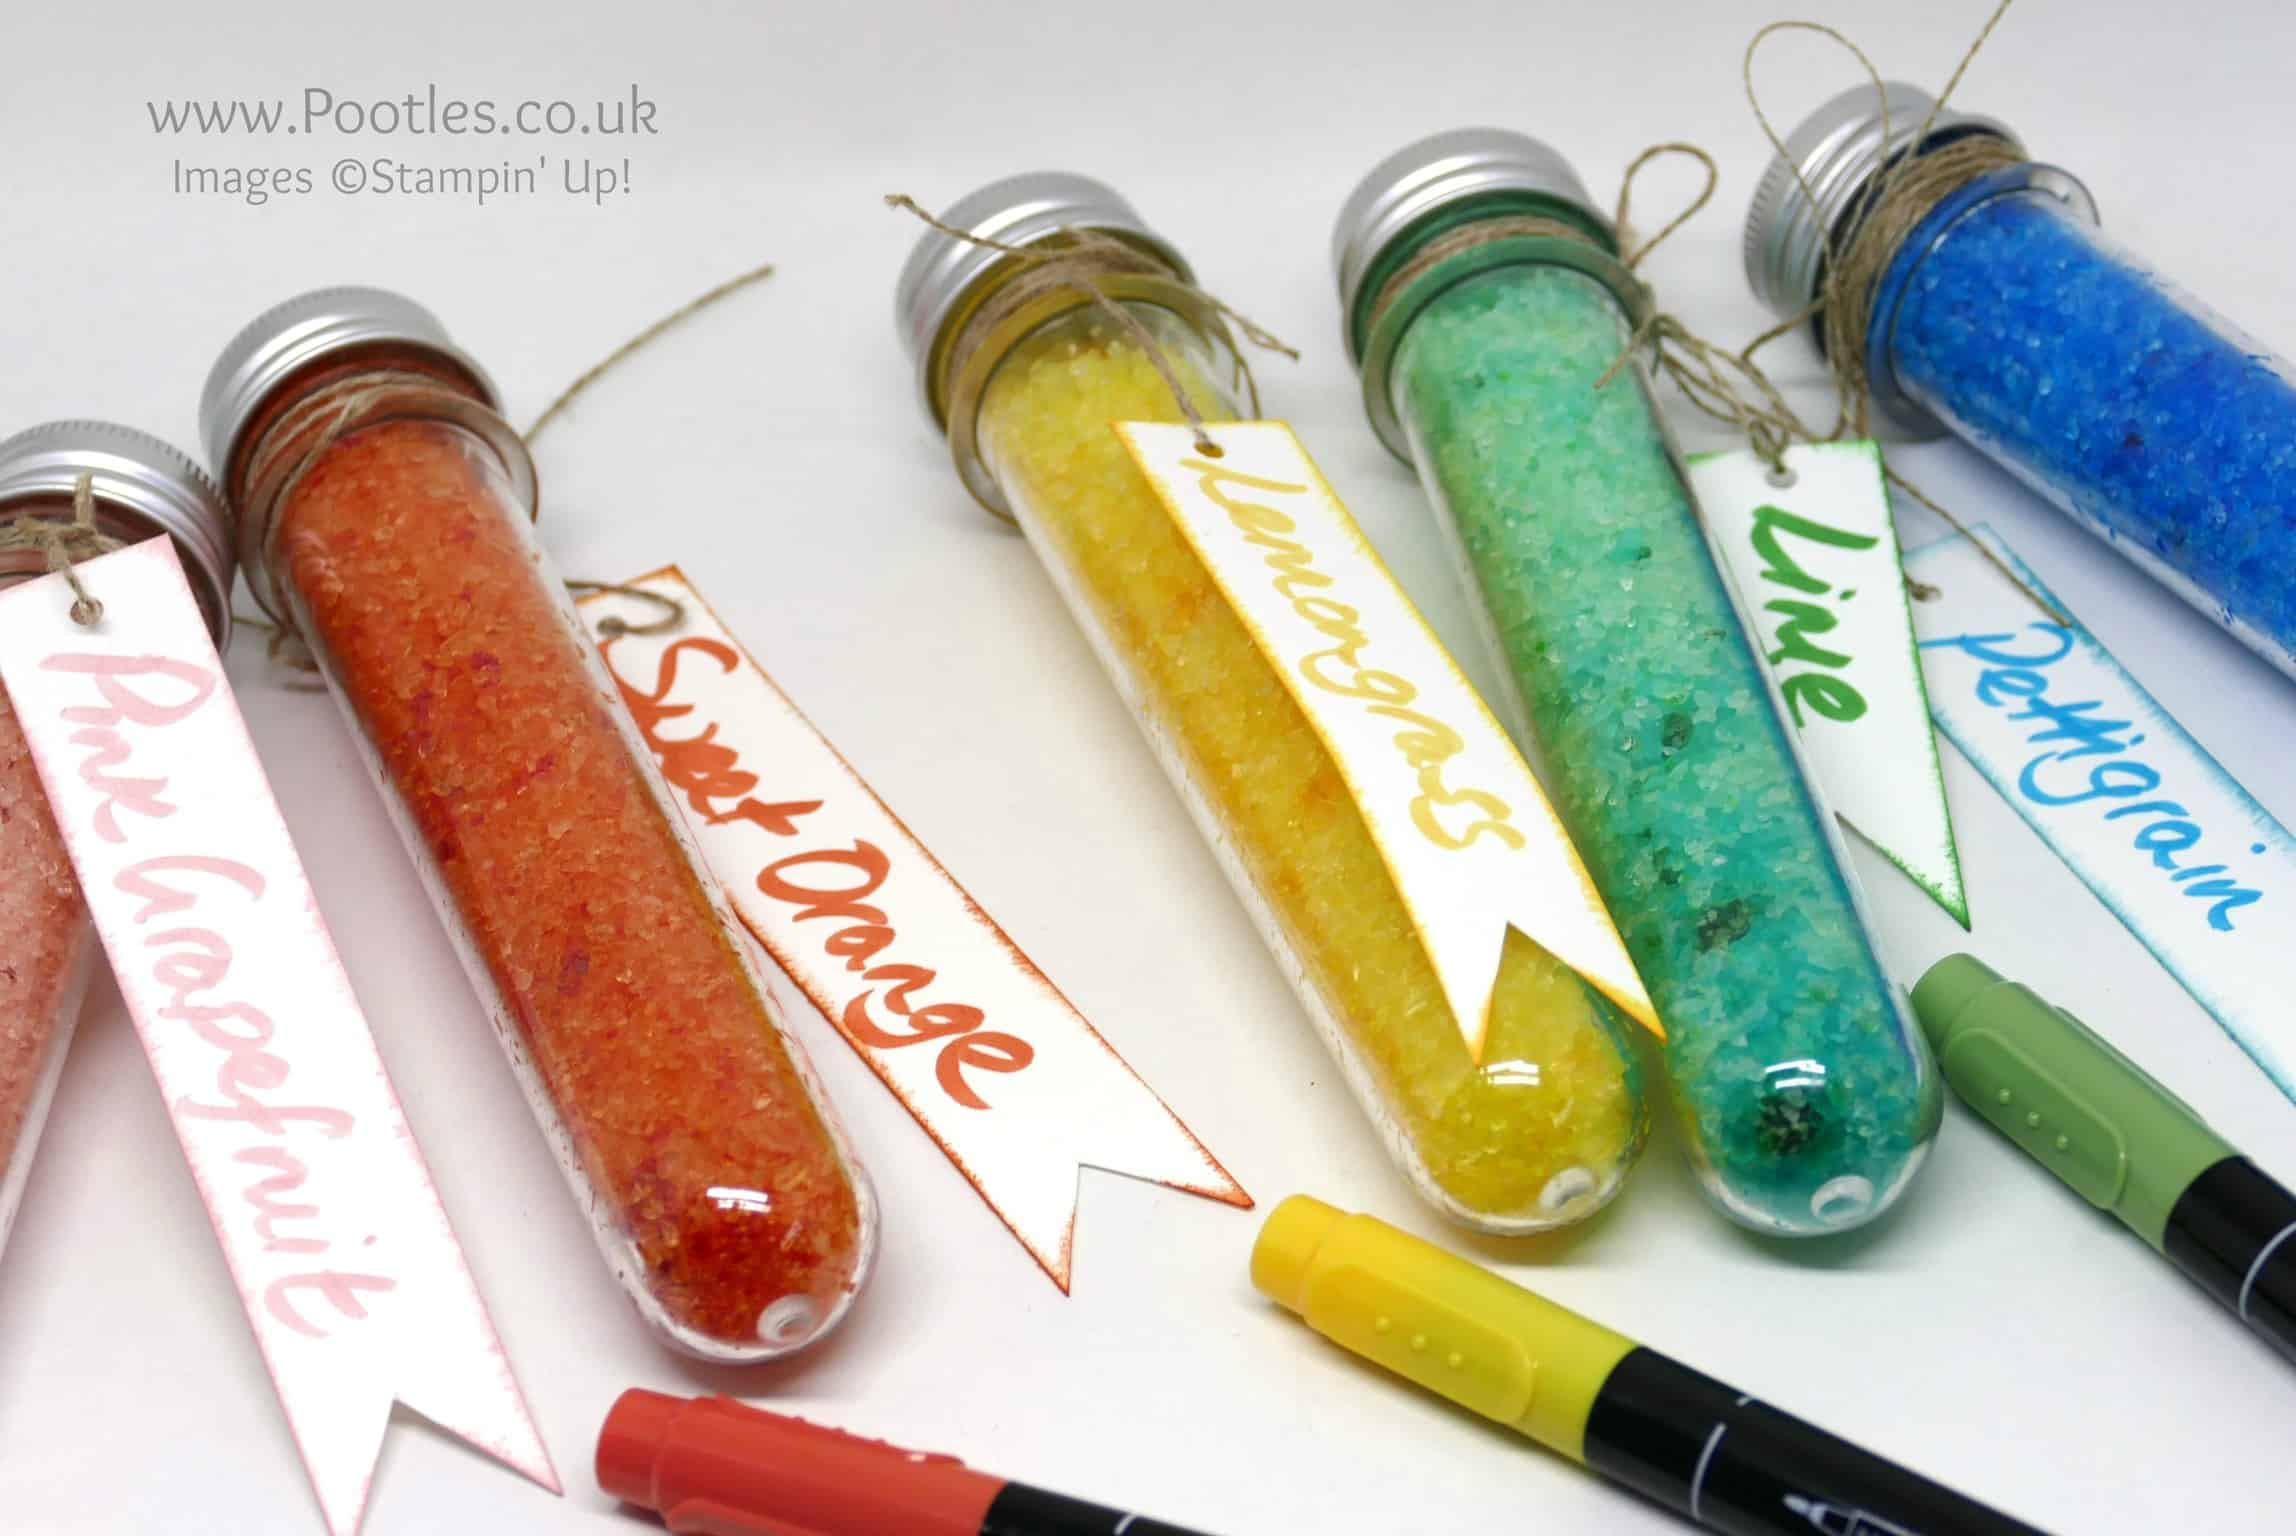 Stampin' Write Marker Tips & Ideas plus Test Tube Treats